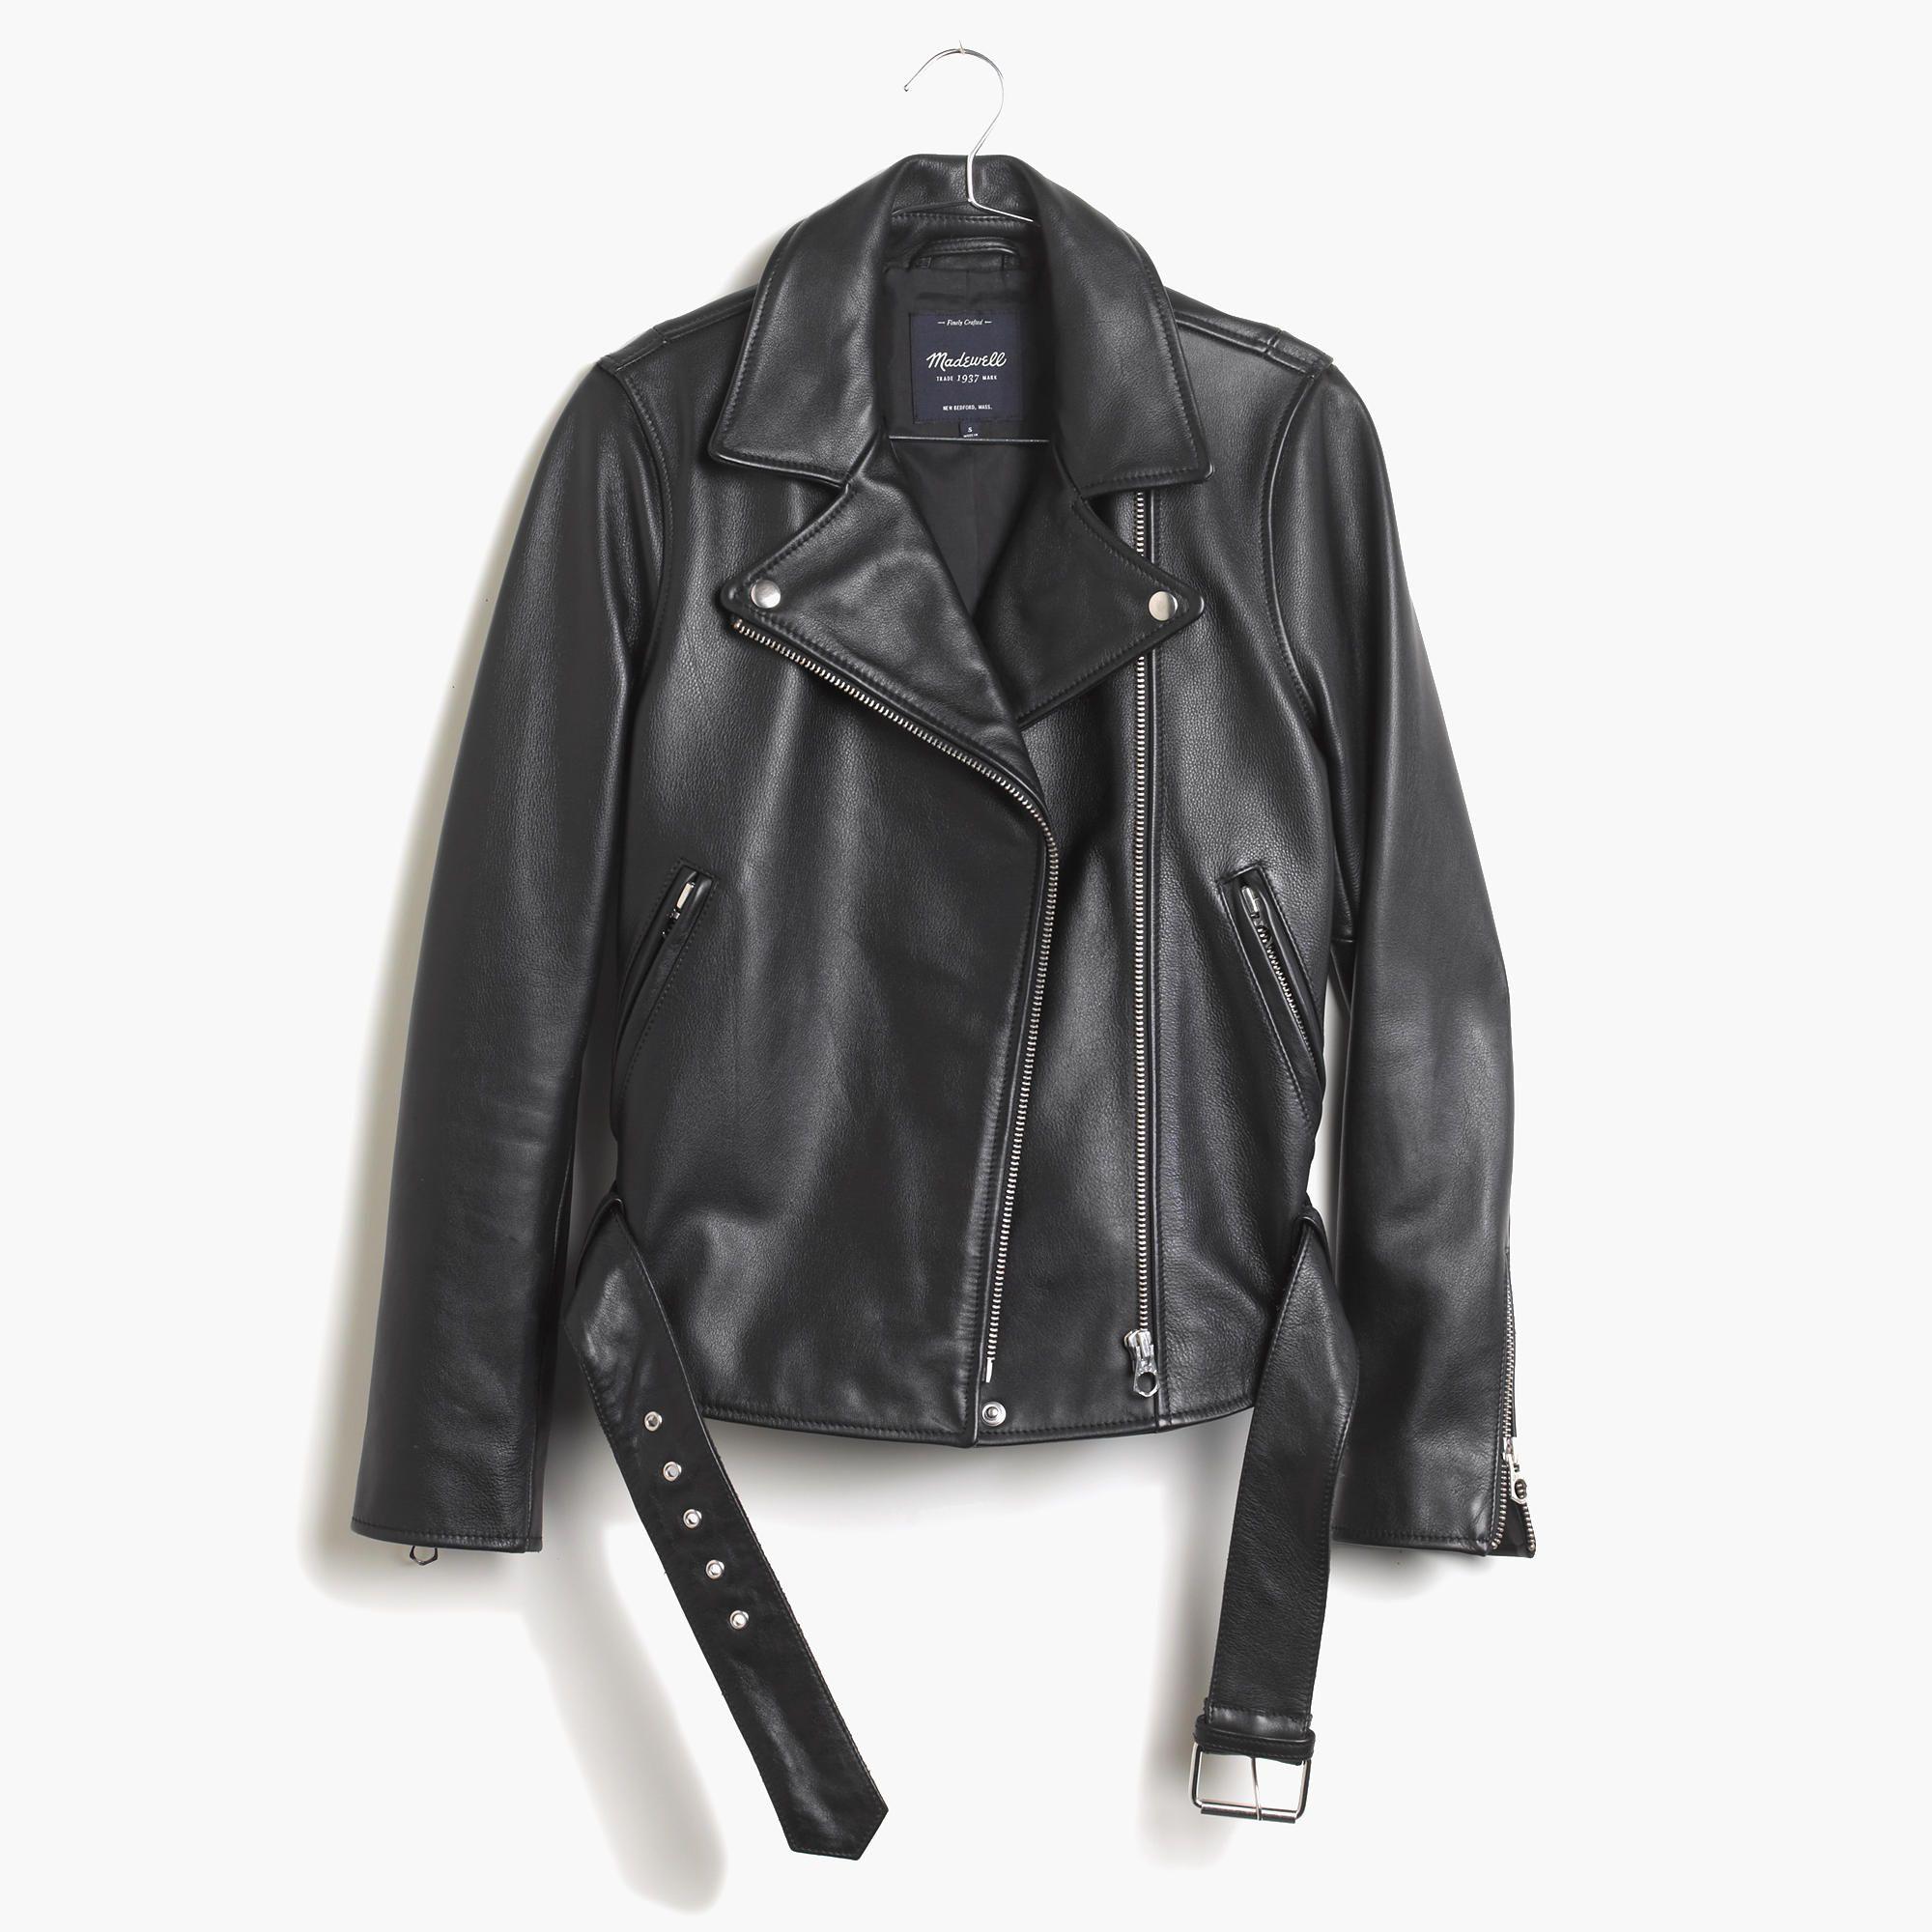 Madewell 530 Real Leather Jacket Leather Jacket Black Motorcycle Jacket [ 2000 x 2000 Pixel ]